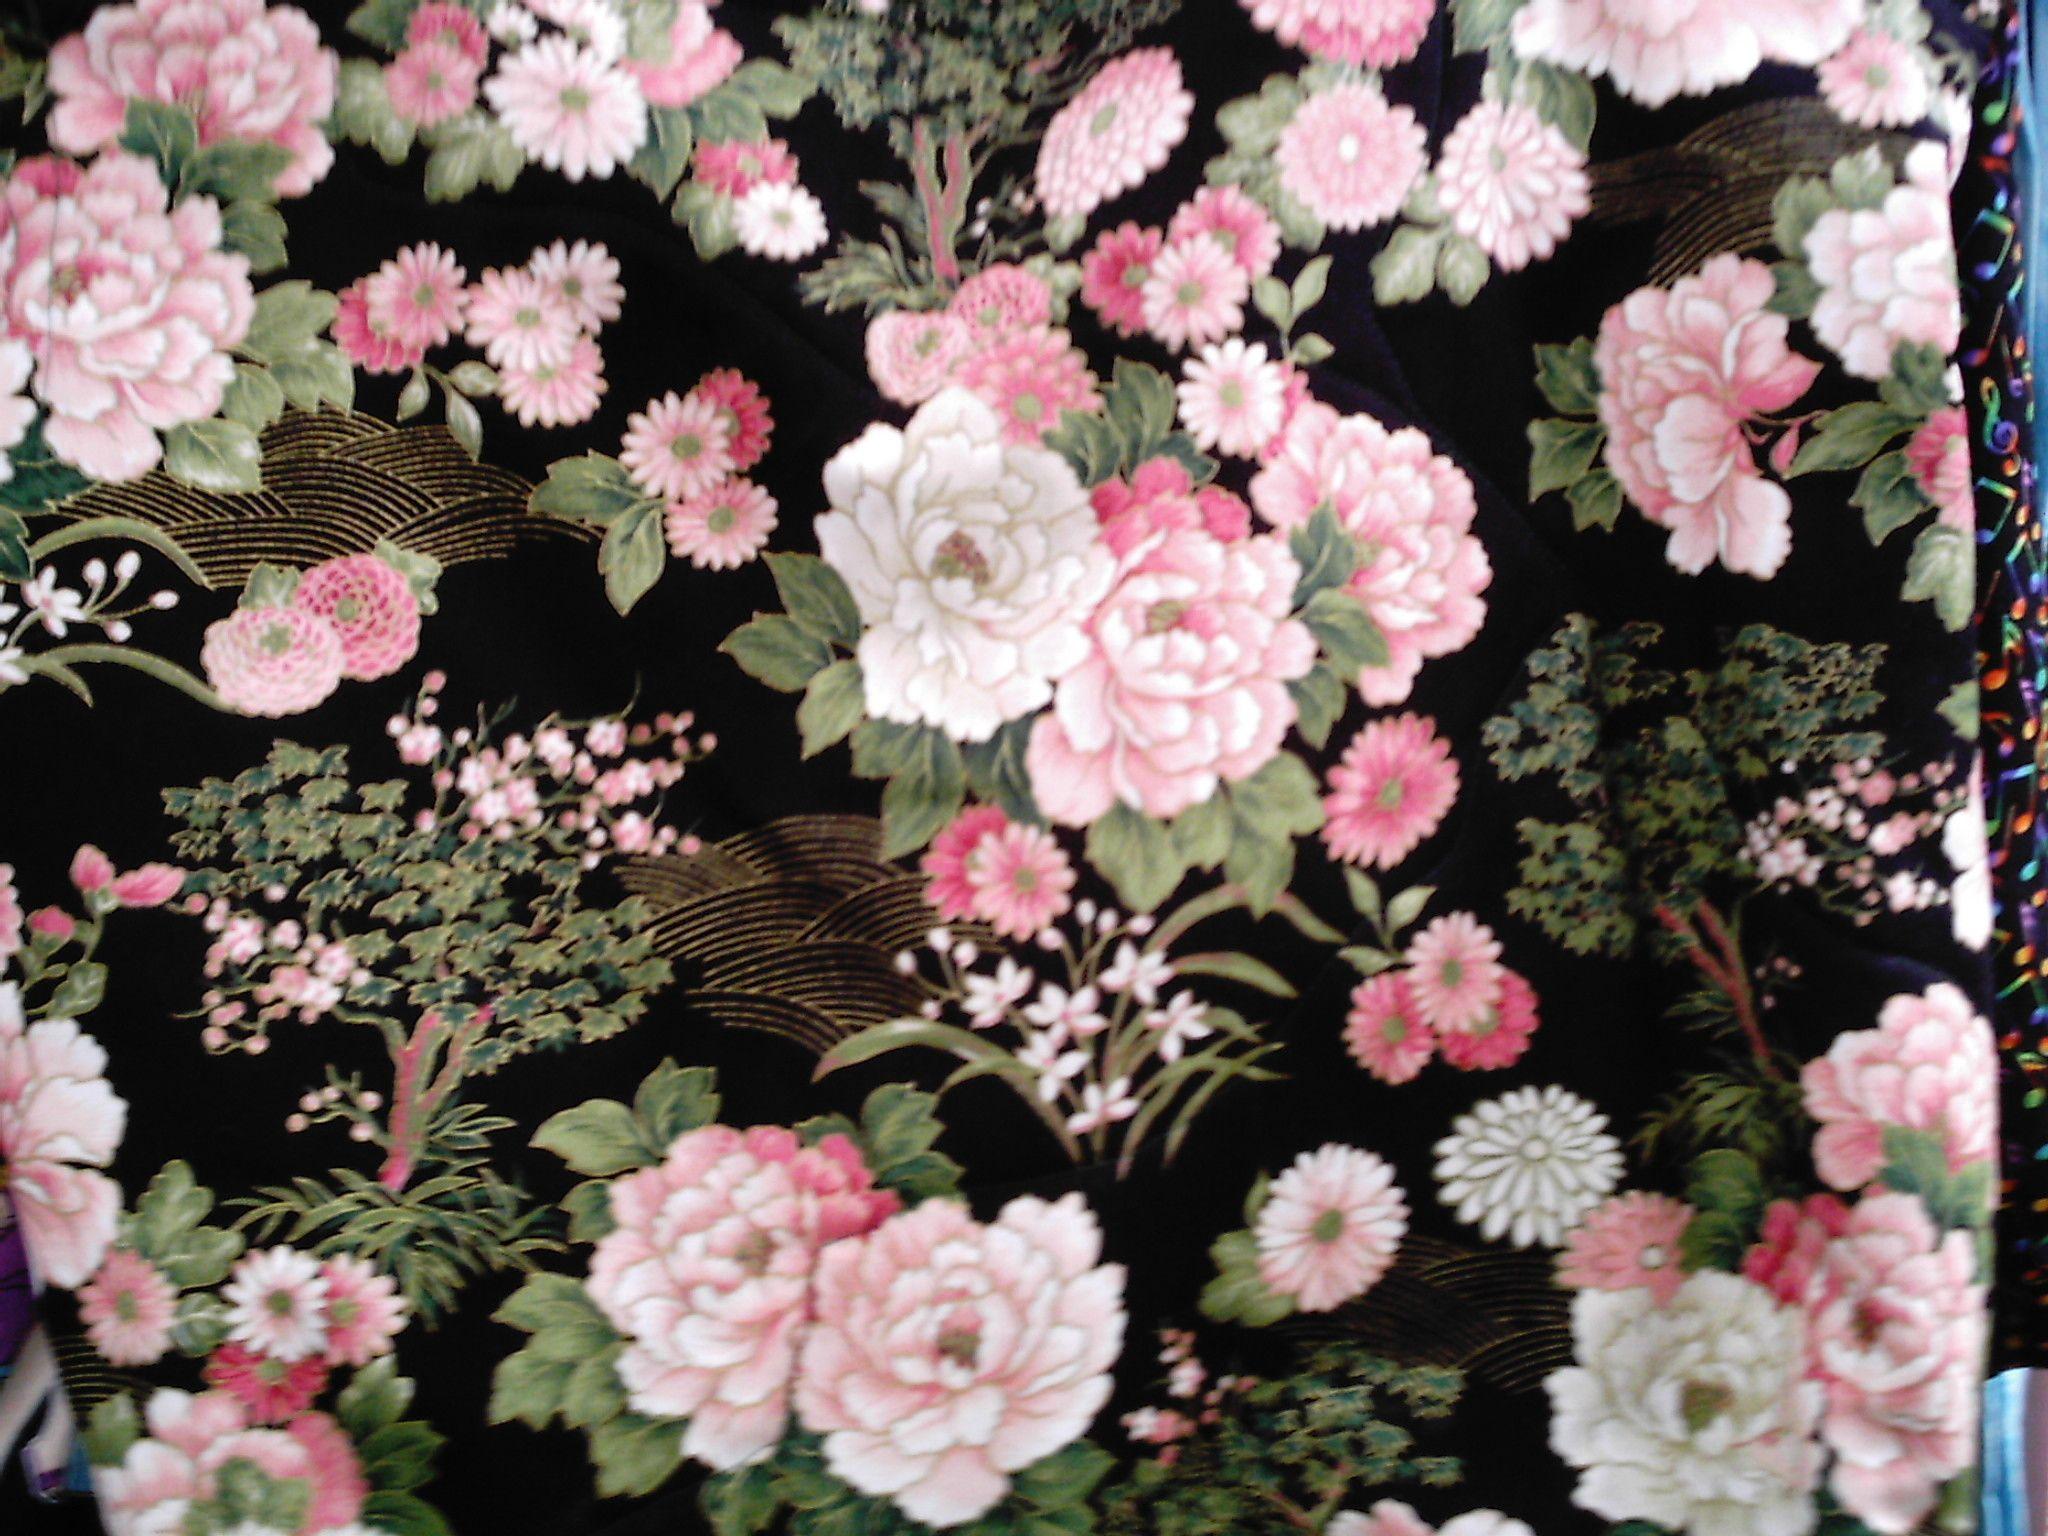 Pin by mona lisa on art in 2020 | black aesthetic wallpaper, rose images, black wallpaper. Flower Wide Aesthetic Dark Wallpapers - Wallpaper Cave